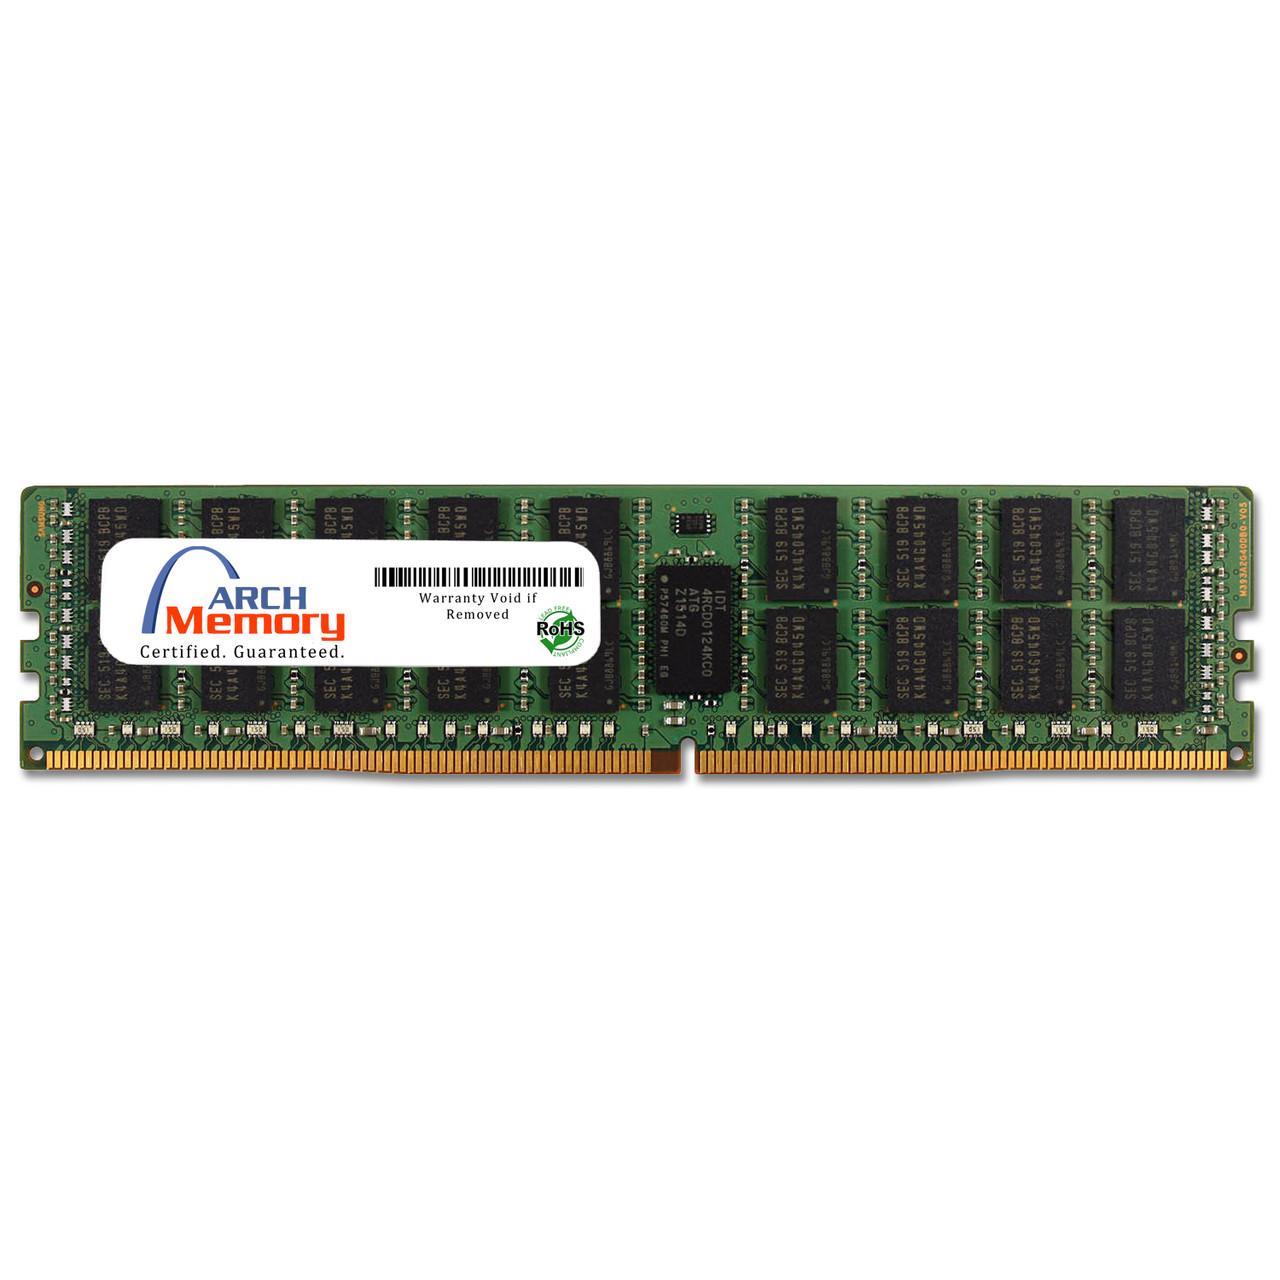 32GB 288-Pin DDR4-2666 PC4-21300 ECC RDIMM Server RAM